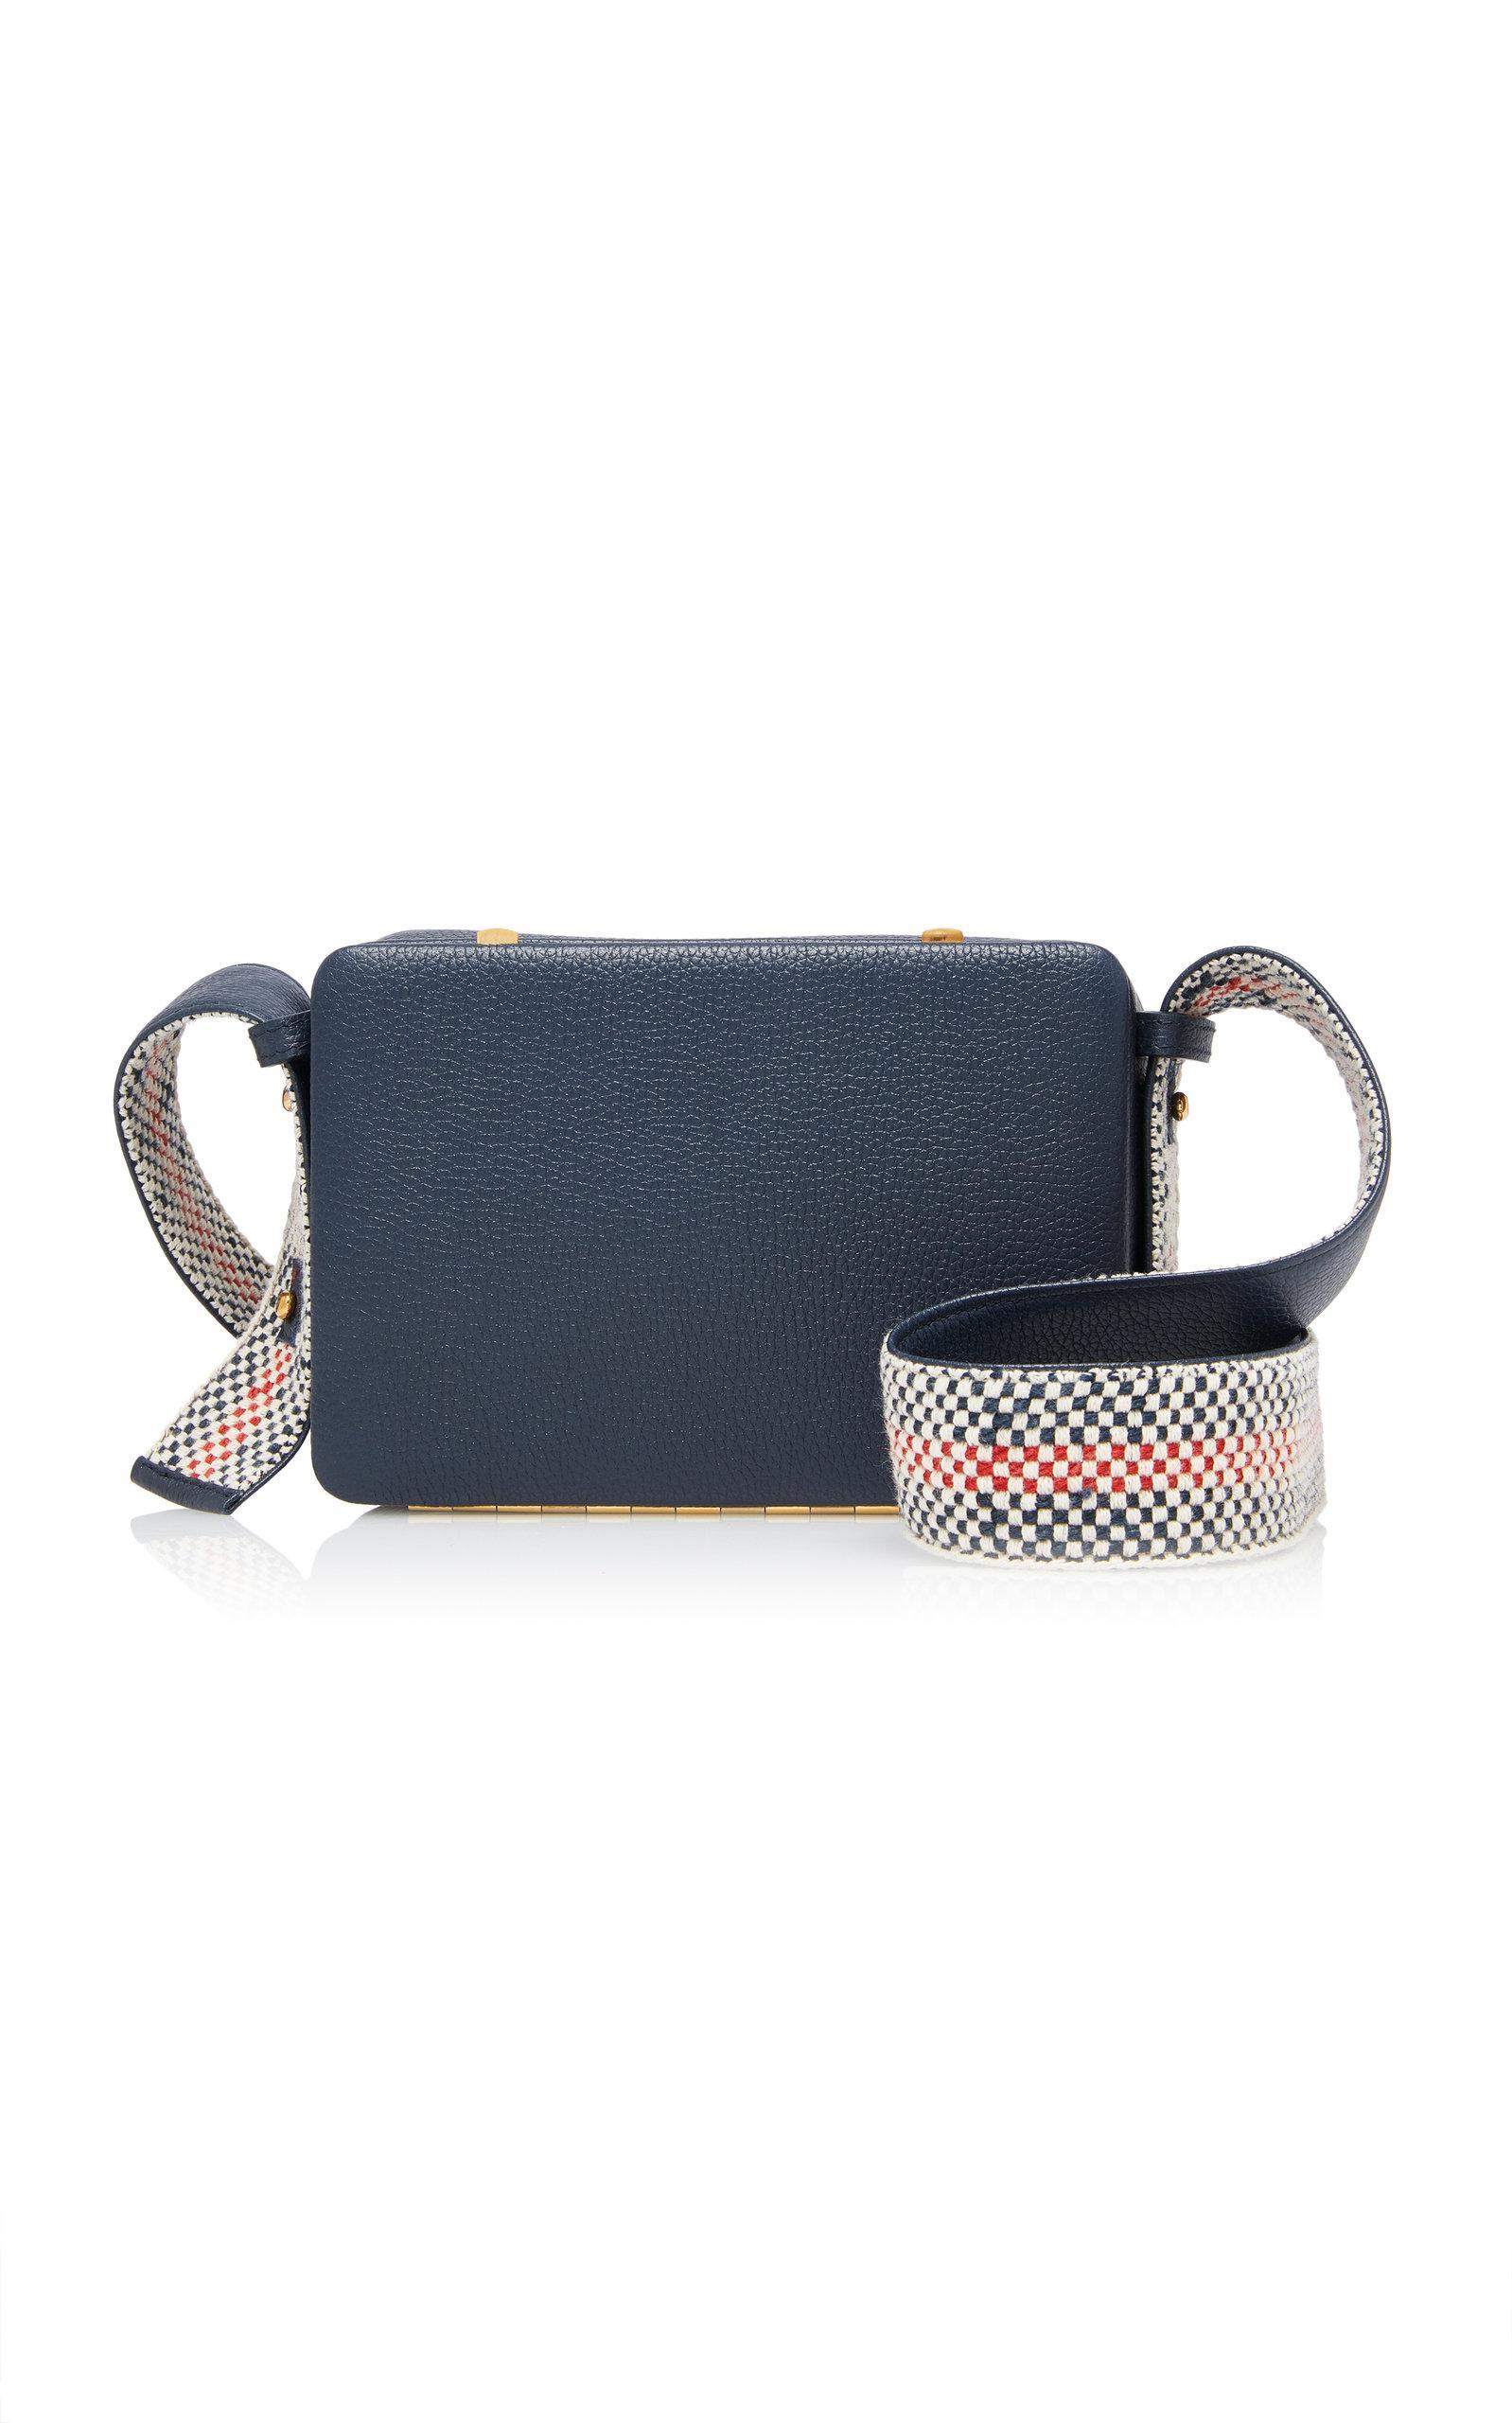 Maya Medium Shoulder Bag with Woven Strap Lutz Morris NtiNptX2f8